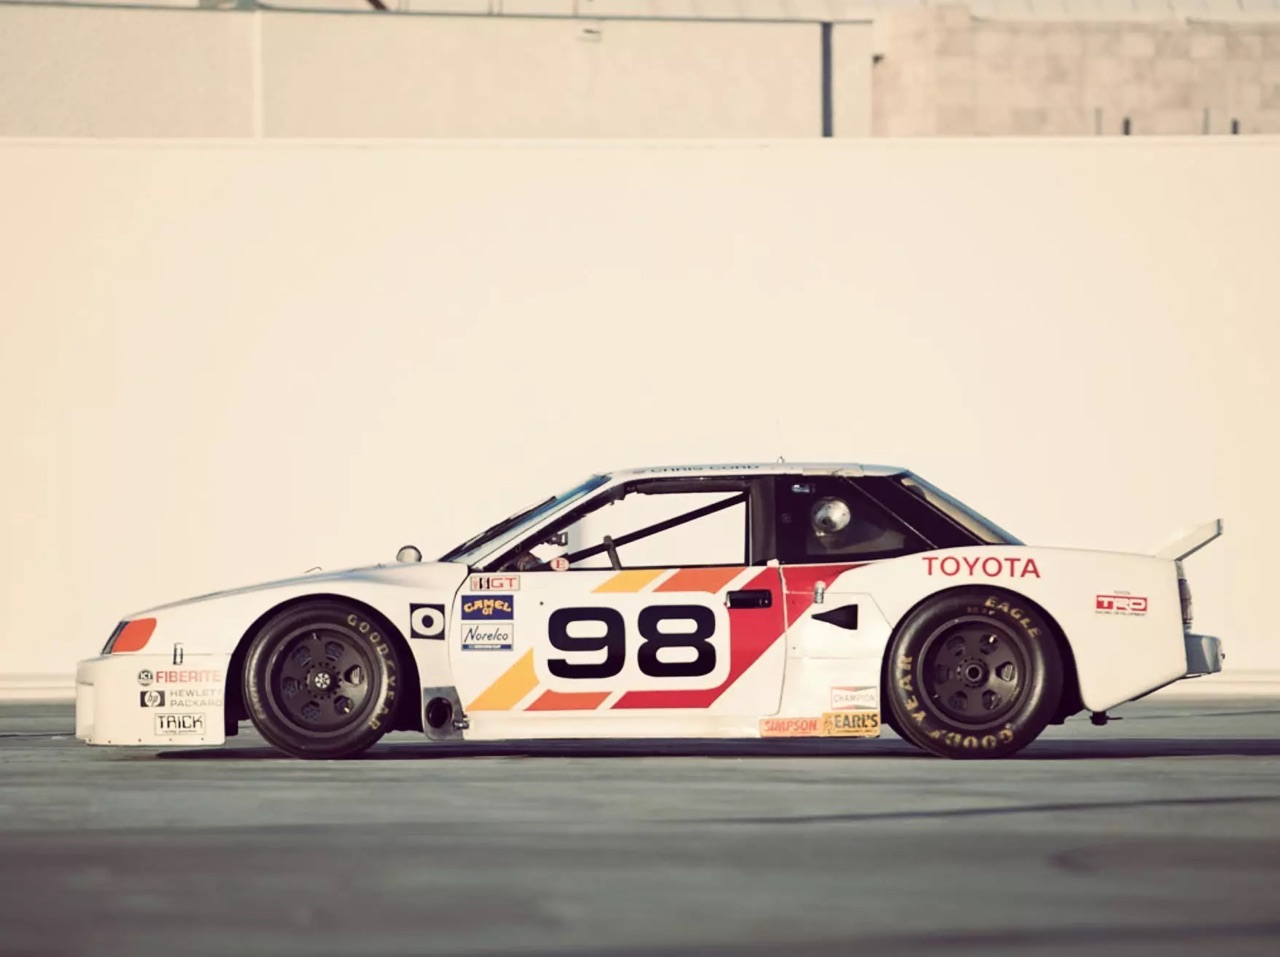 Toyota Celica Turbo IMSA GTO - 100% débridée ! 16